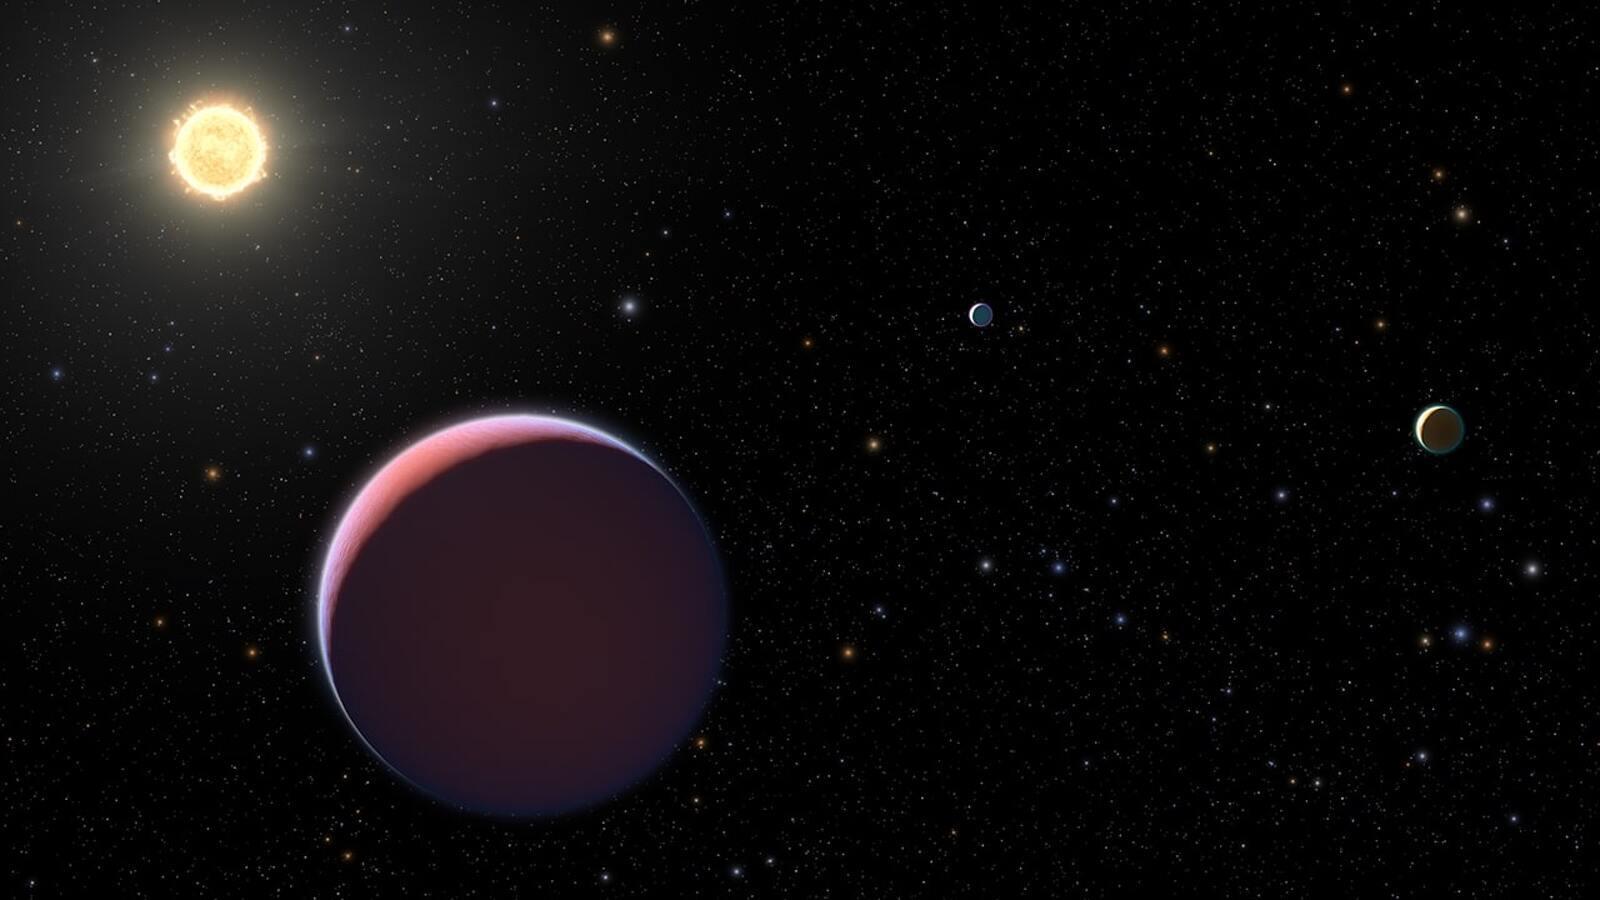 Reproducció artística del sistema Kepler 51